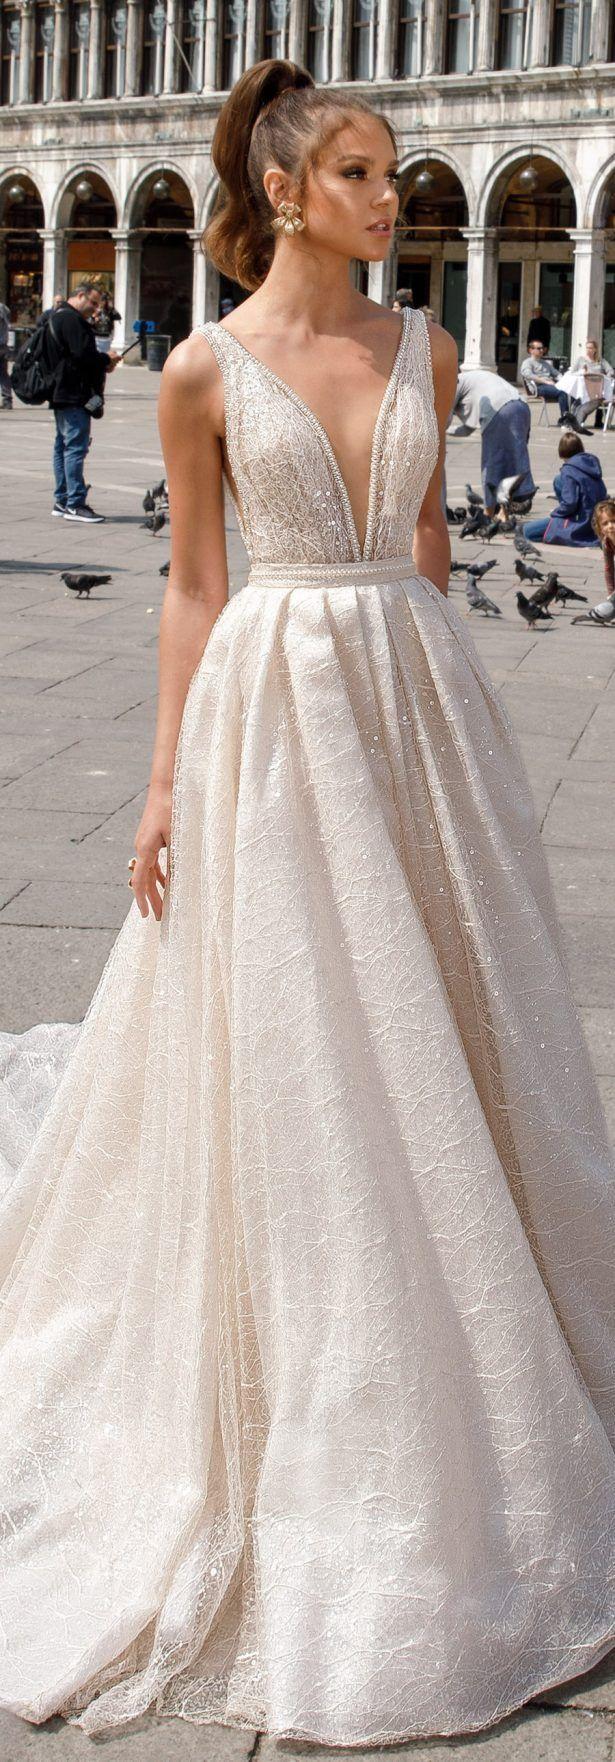 Julie vino spring wedding dress venezia bridal collection